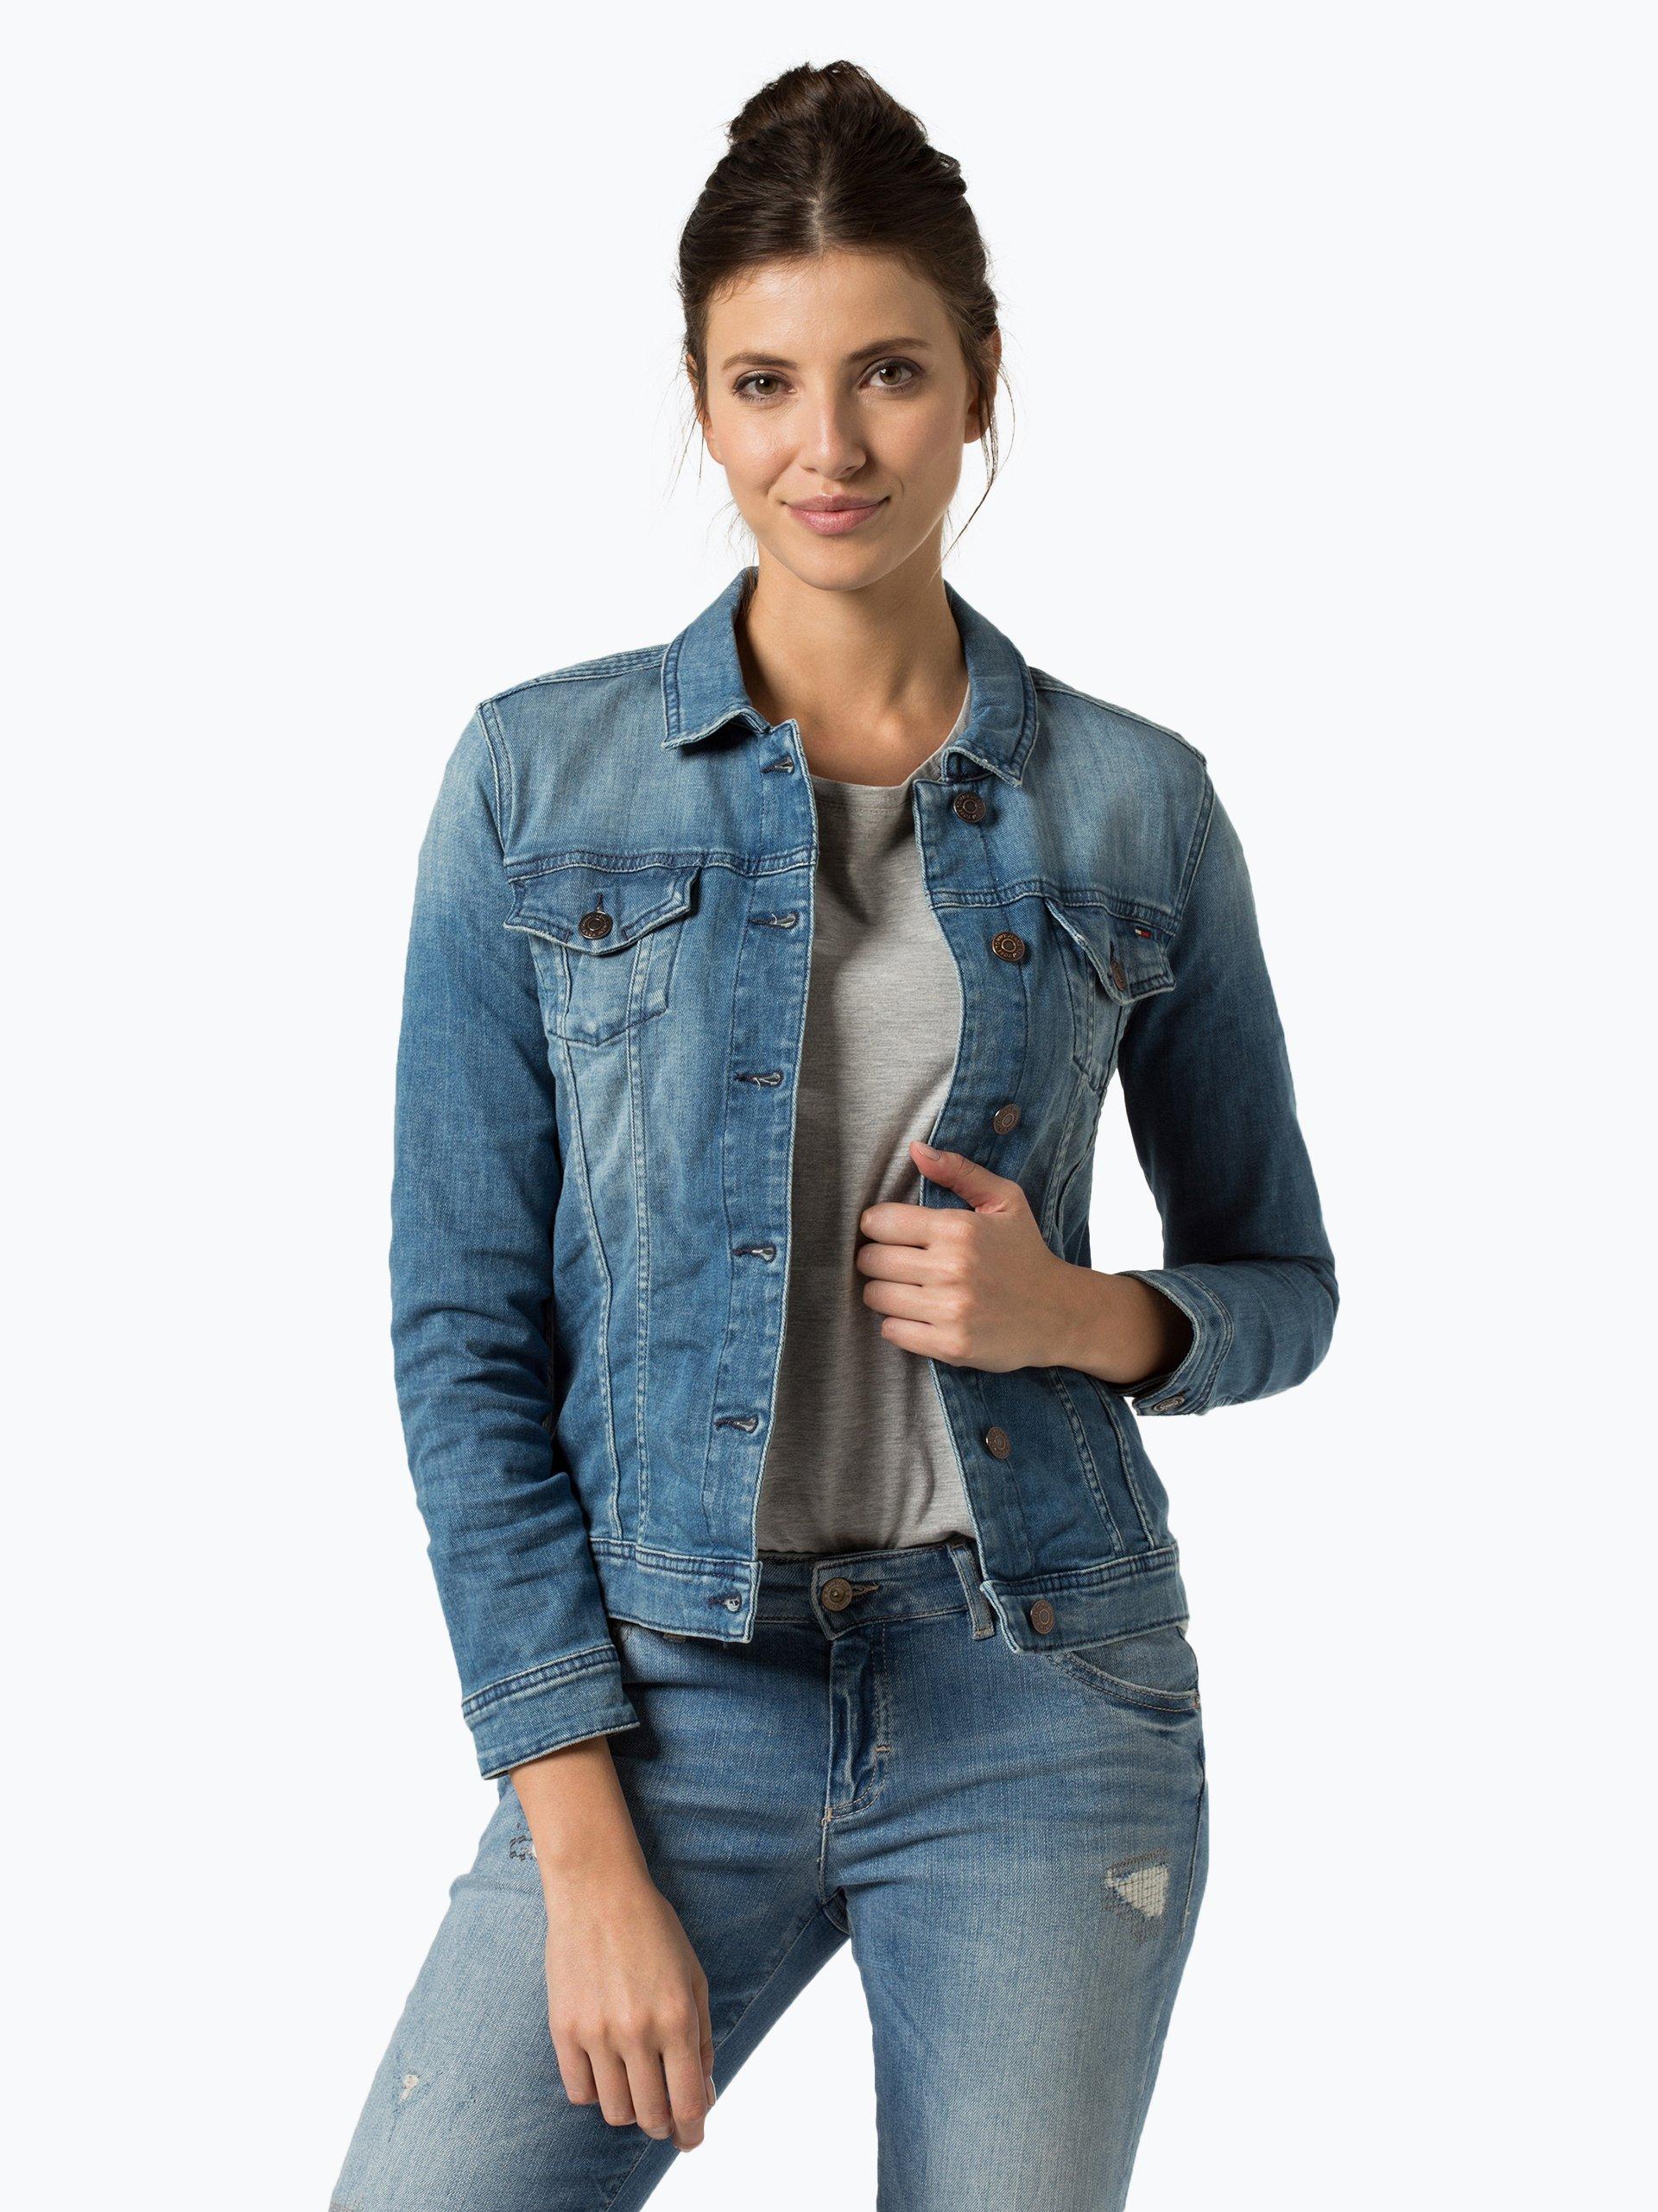 tommy jeans damen jeansjacke vivianne hellblau uni online kaufen vangraaf com. Black Bedroom Furniture Sets. Home Design Ideas